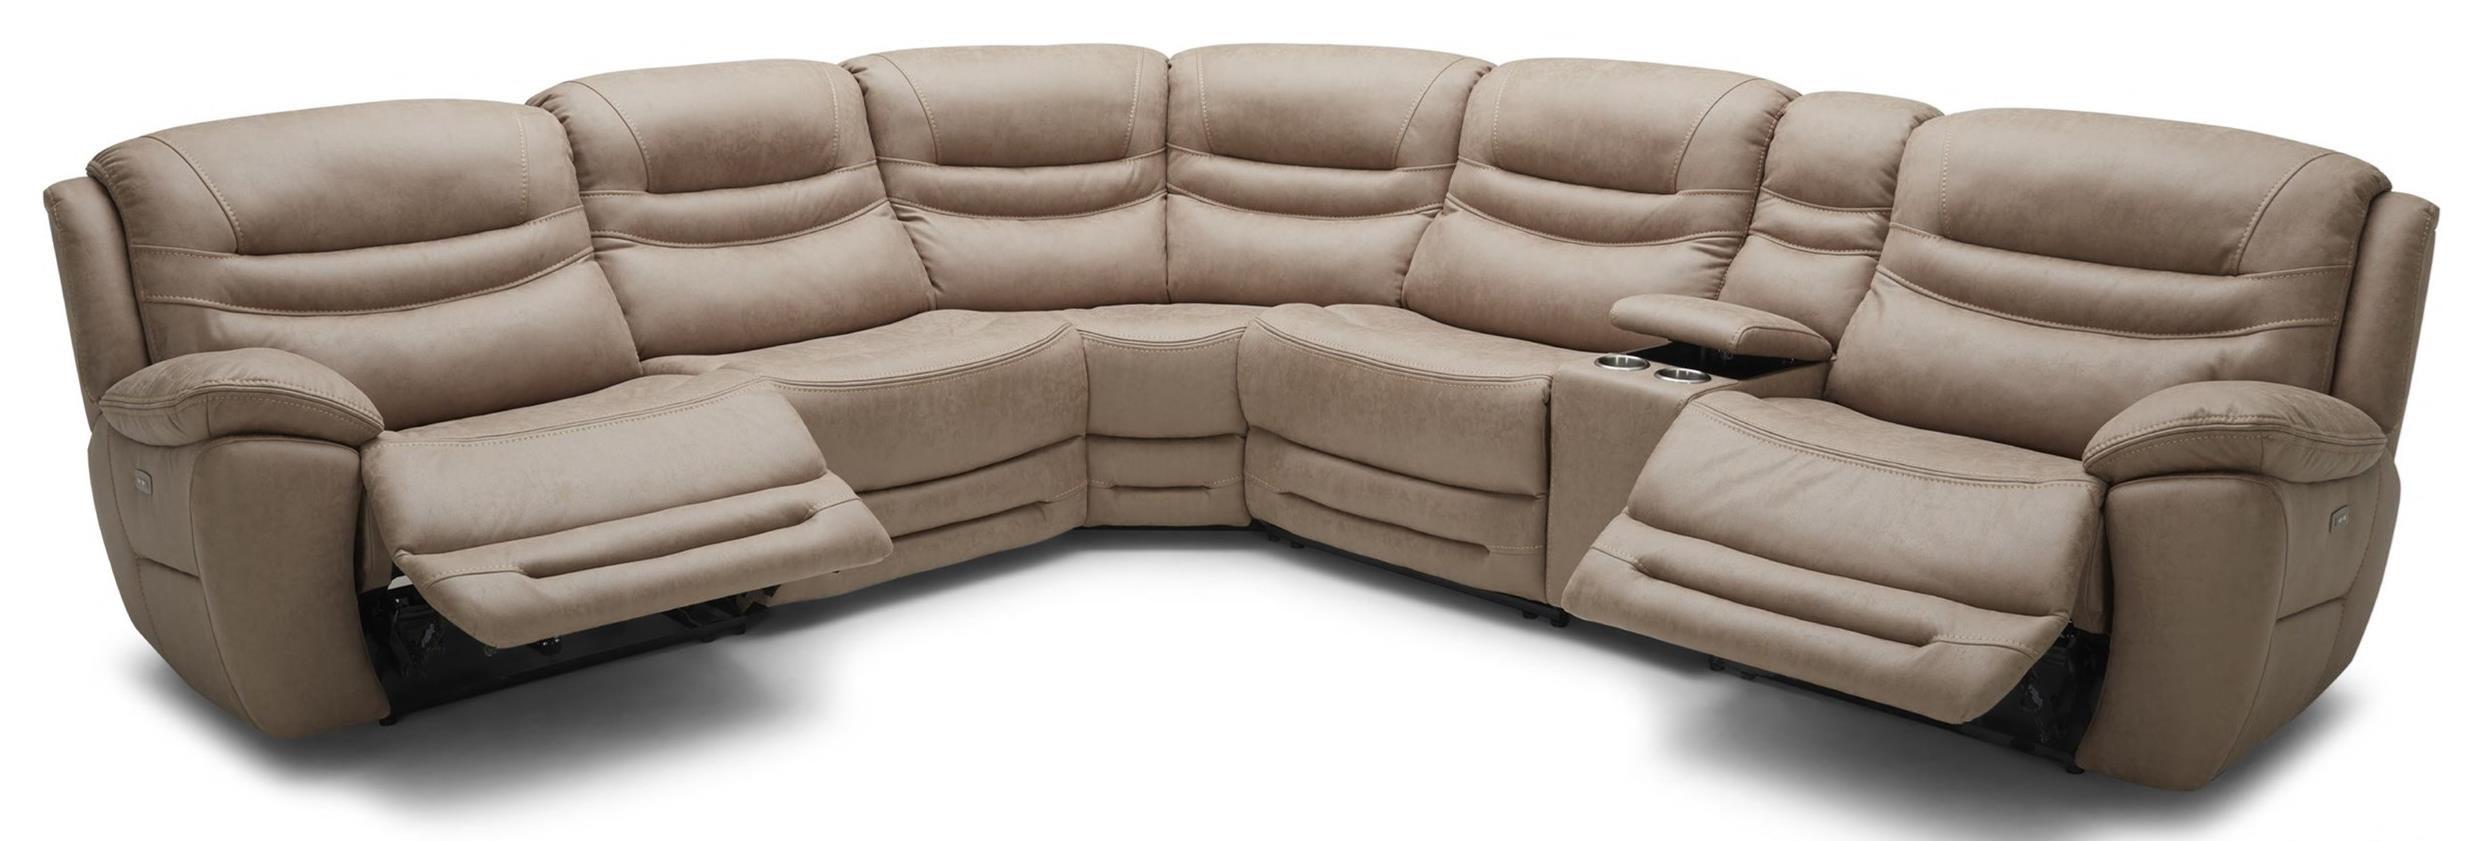 kuka home km083 six piece reclining sectional sofa with cupholder rh wilsonhomefurnishings com